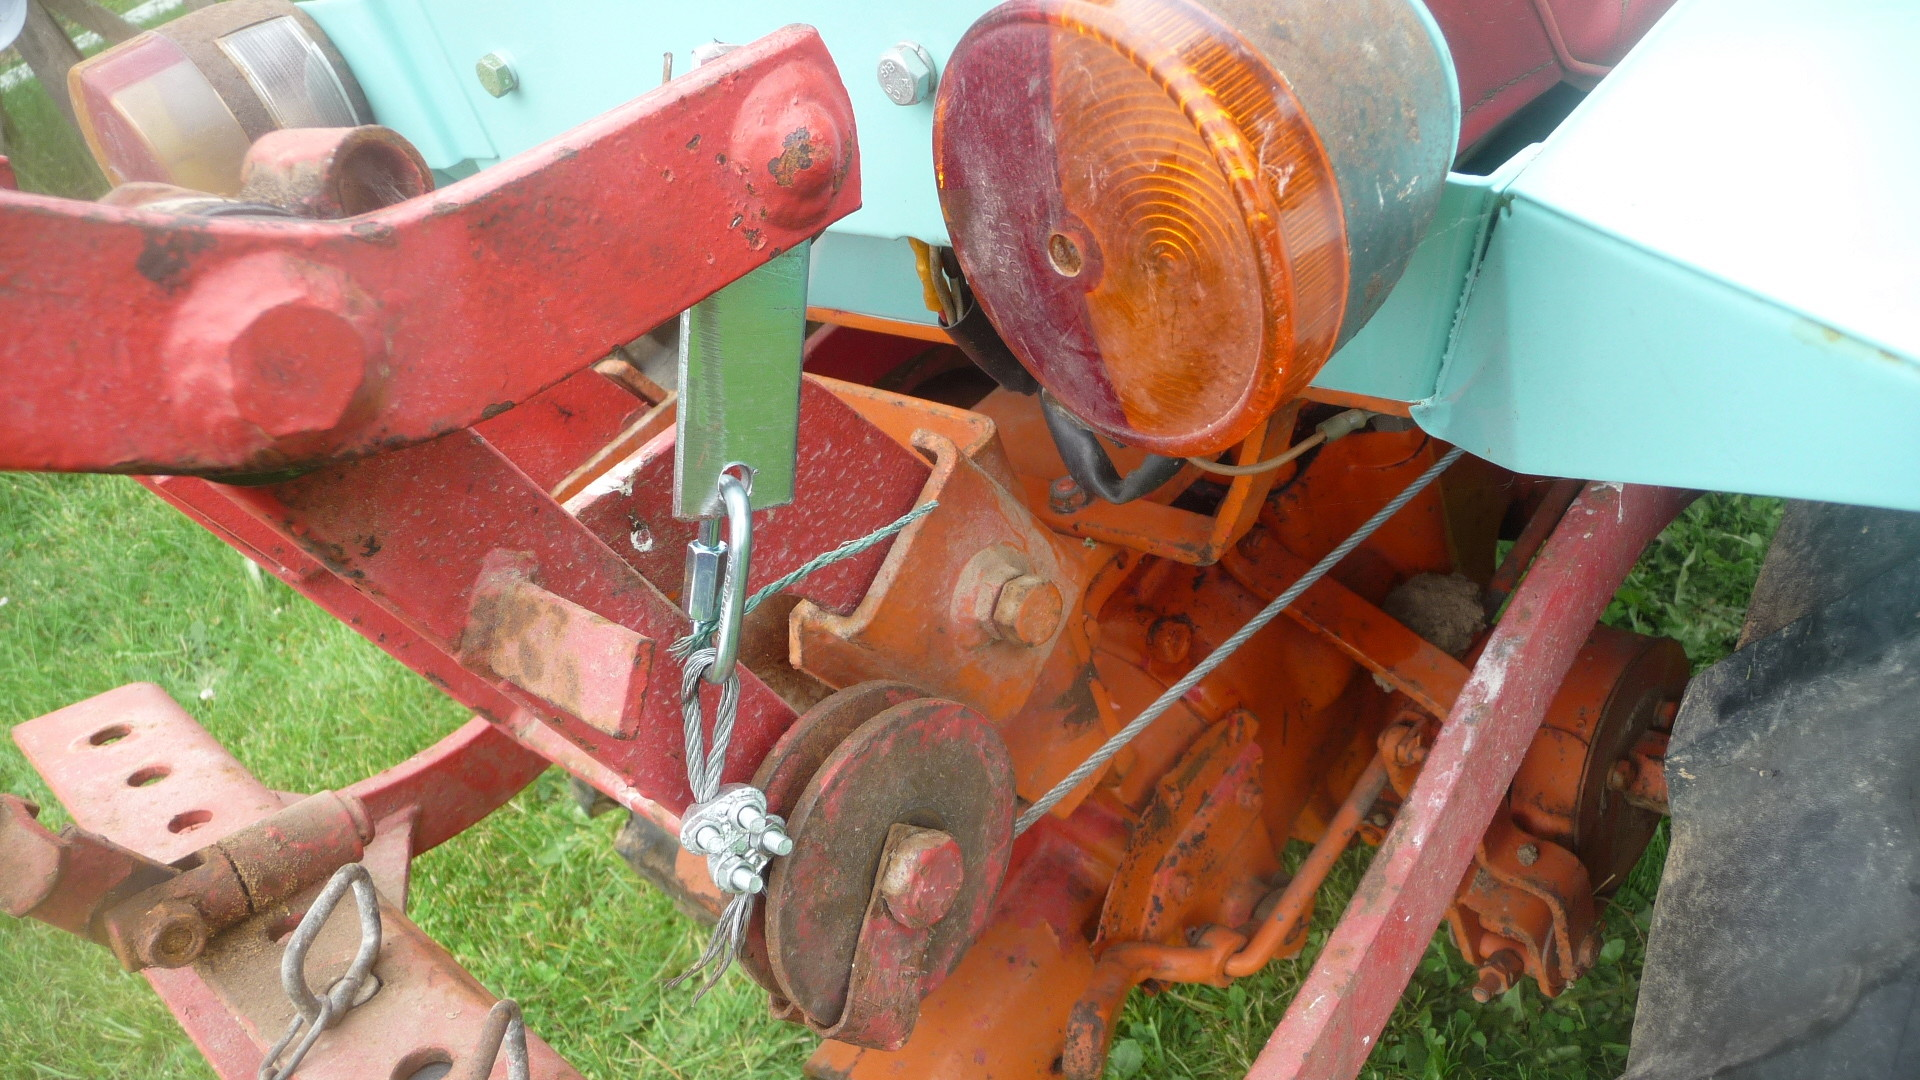 TRACTEUR - Micro-tracteur Motostandard 1031, bientot dans la cour P1110215